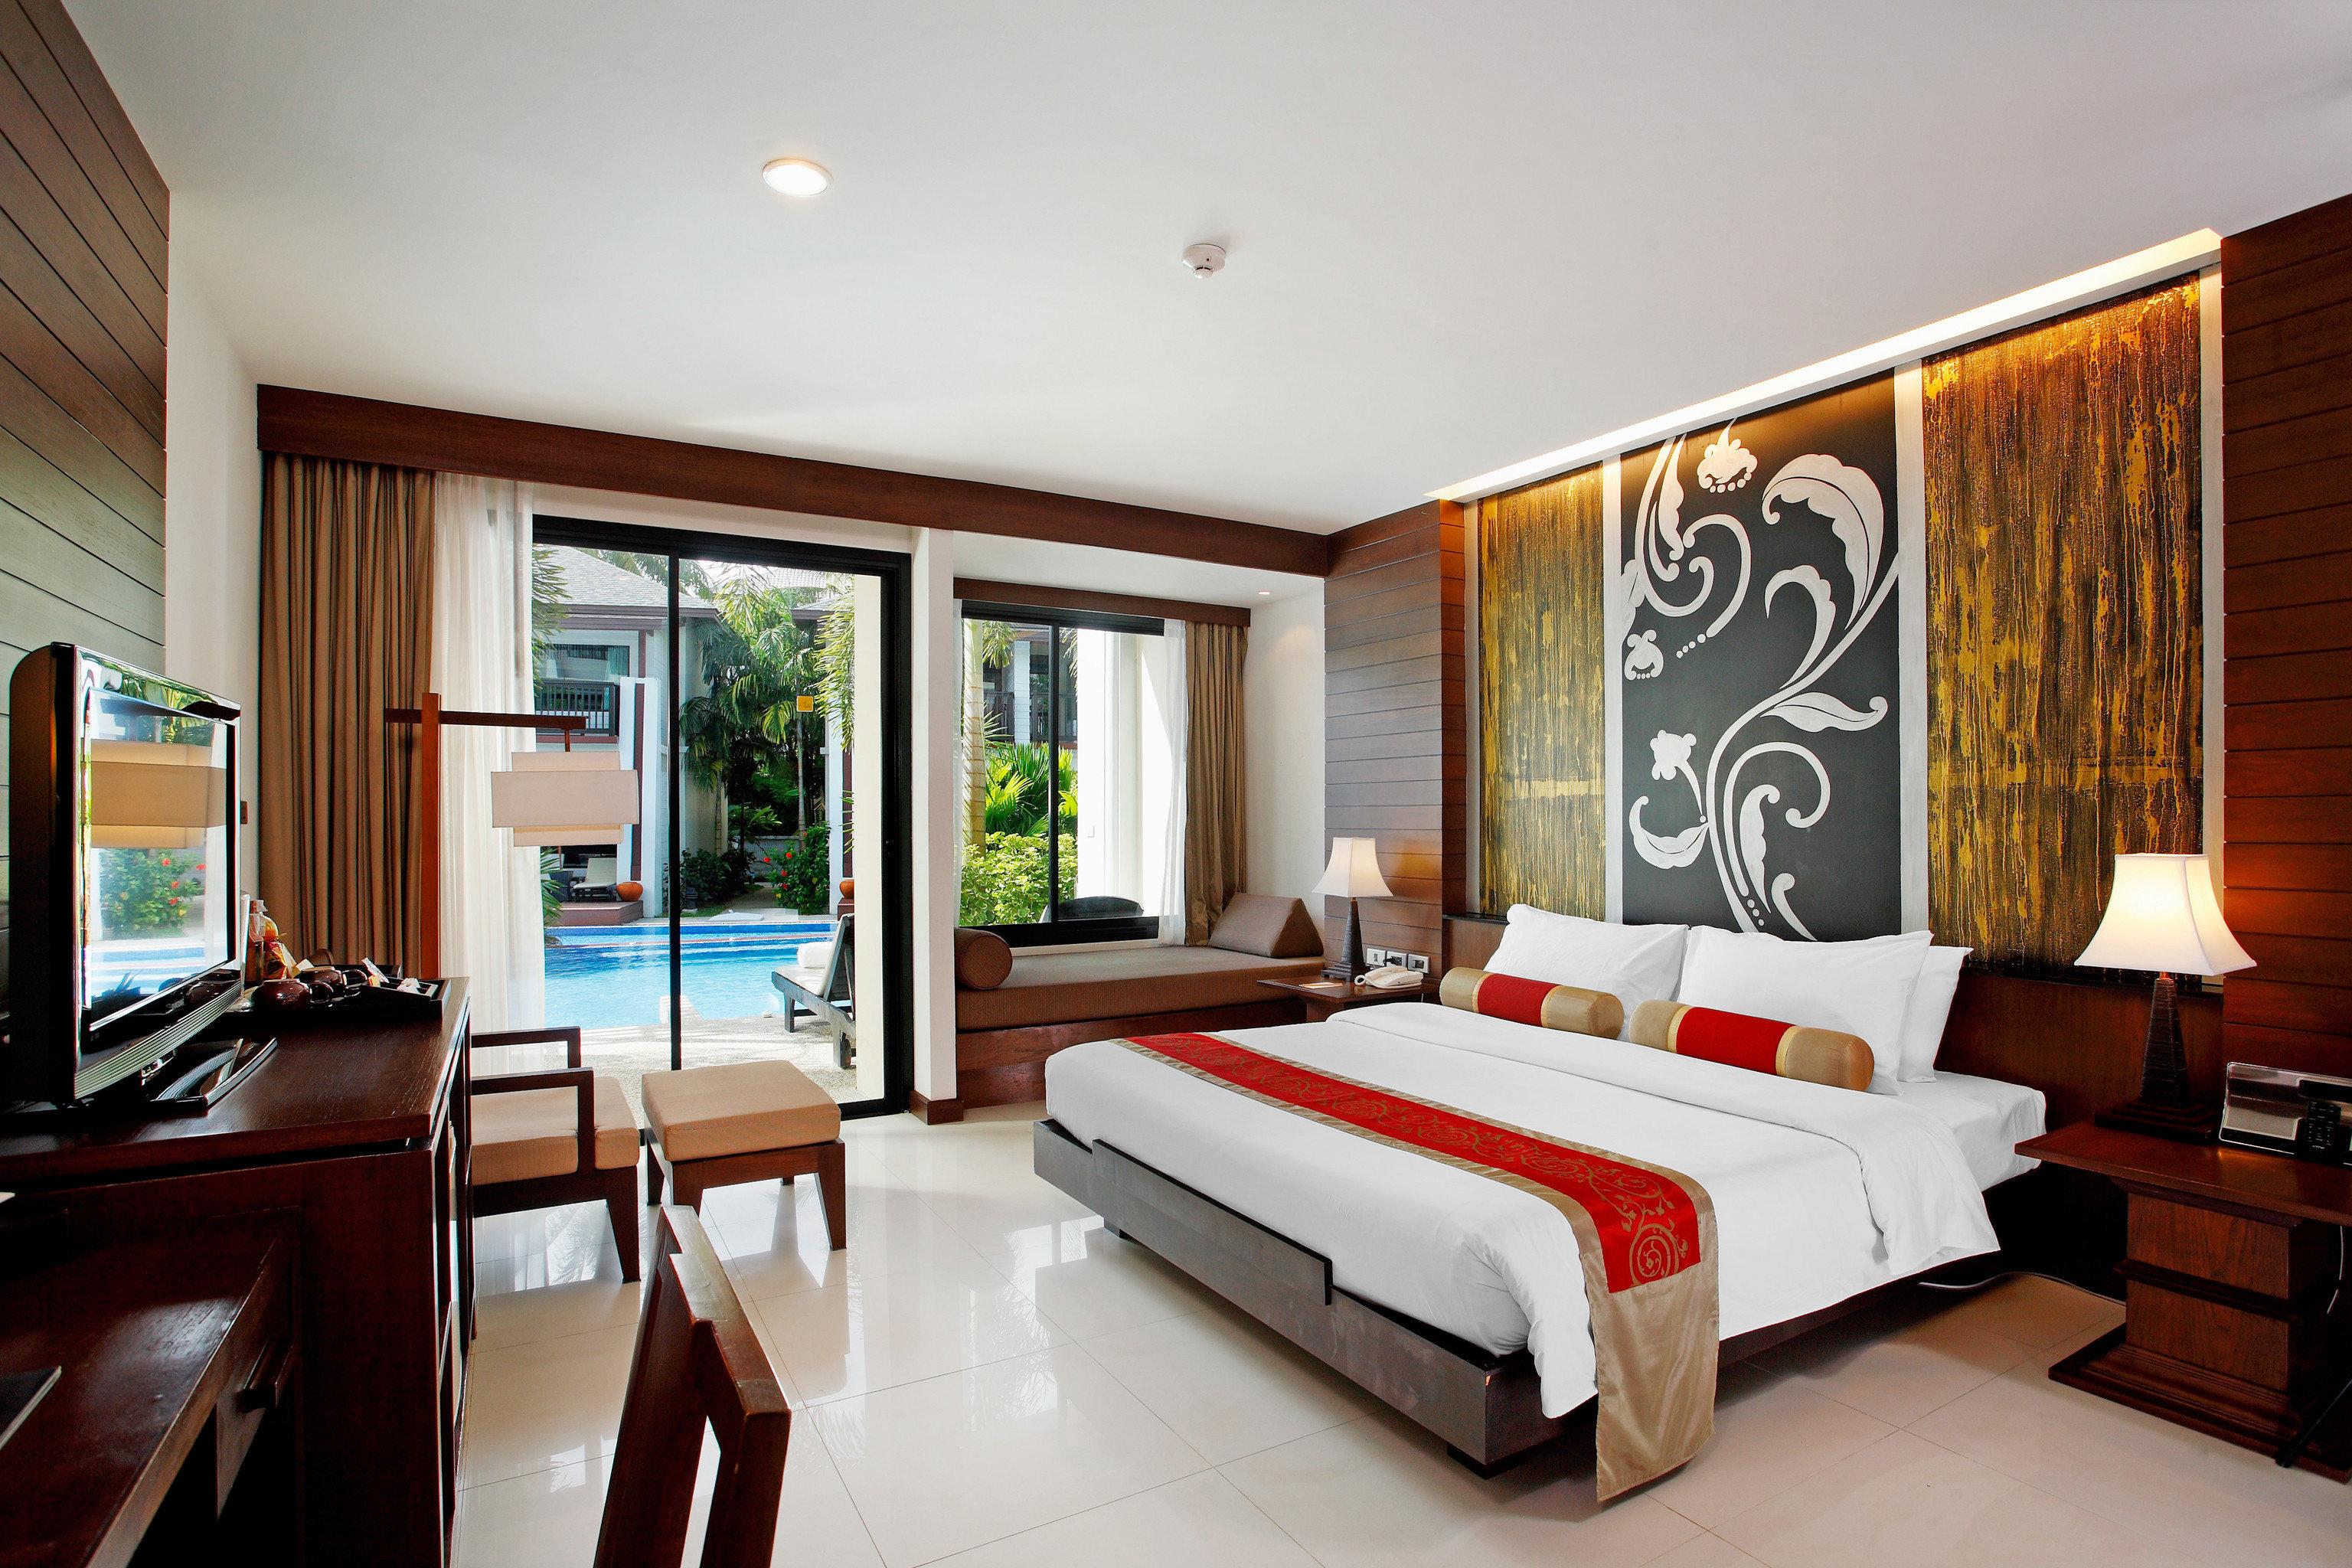 Beachfront Bedroom Romantic property condominium Suite living room home Resort Villa Modern